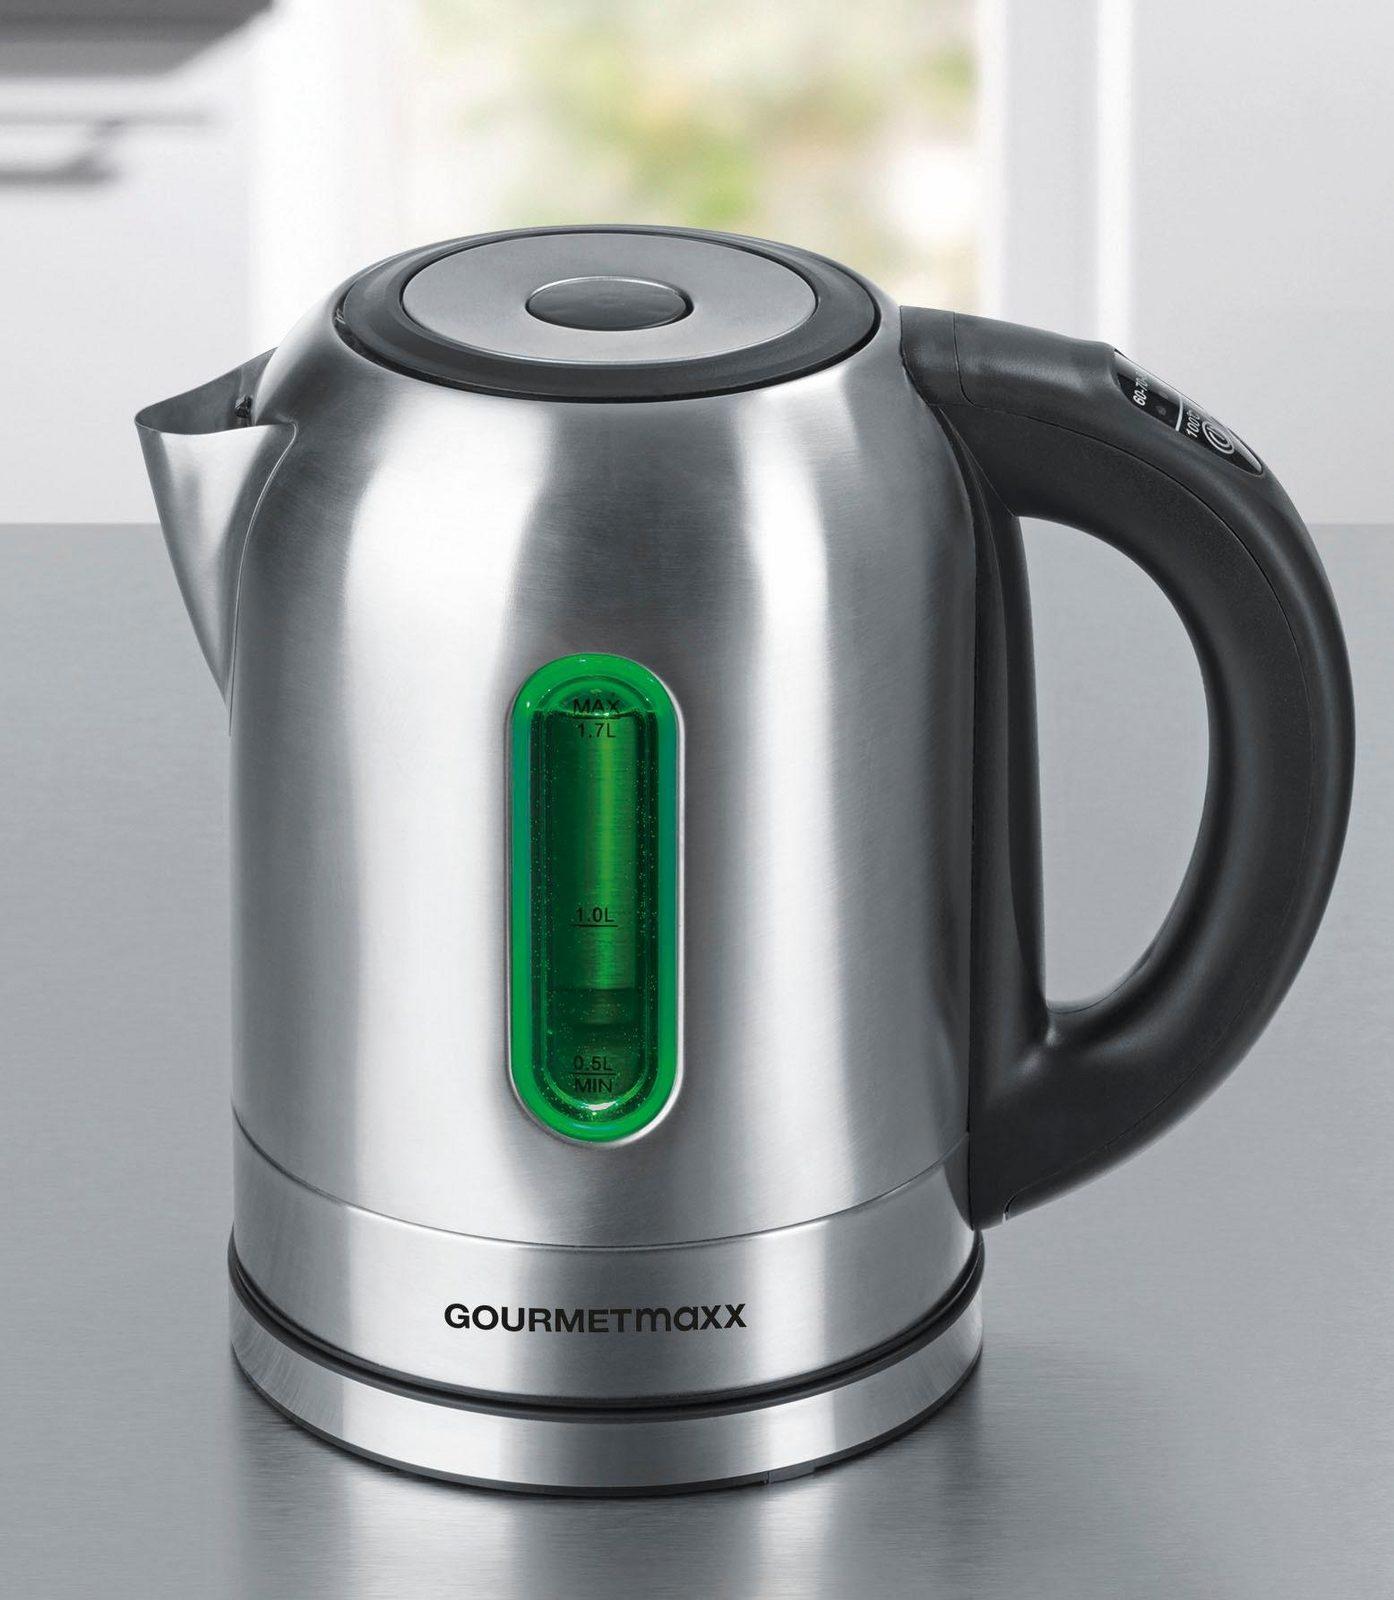 Gourmet Maxx Wasserkocher, LED-Temperaturwahl, 1,7 Liter, 2200 Watt, Edelstahl - broschei